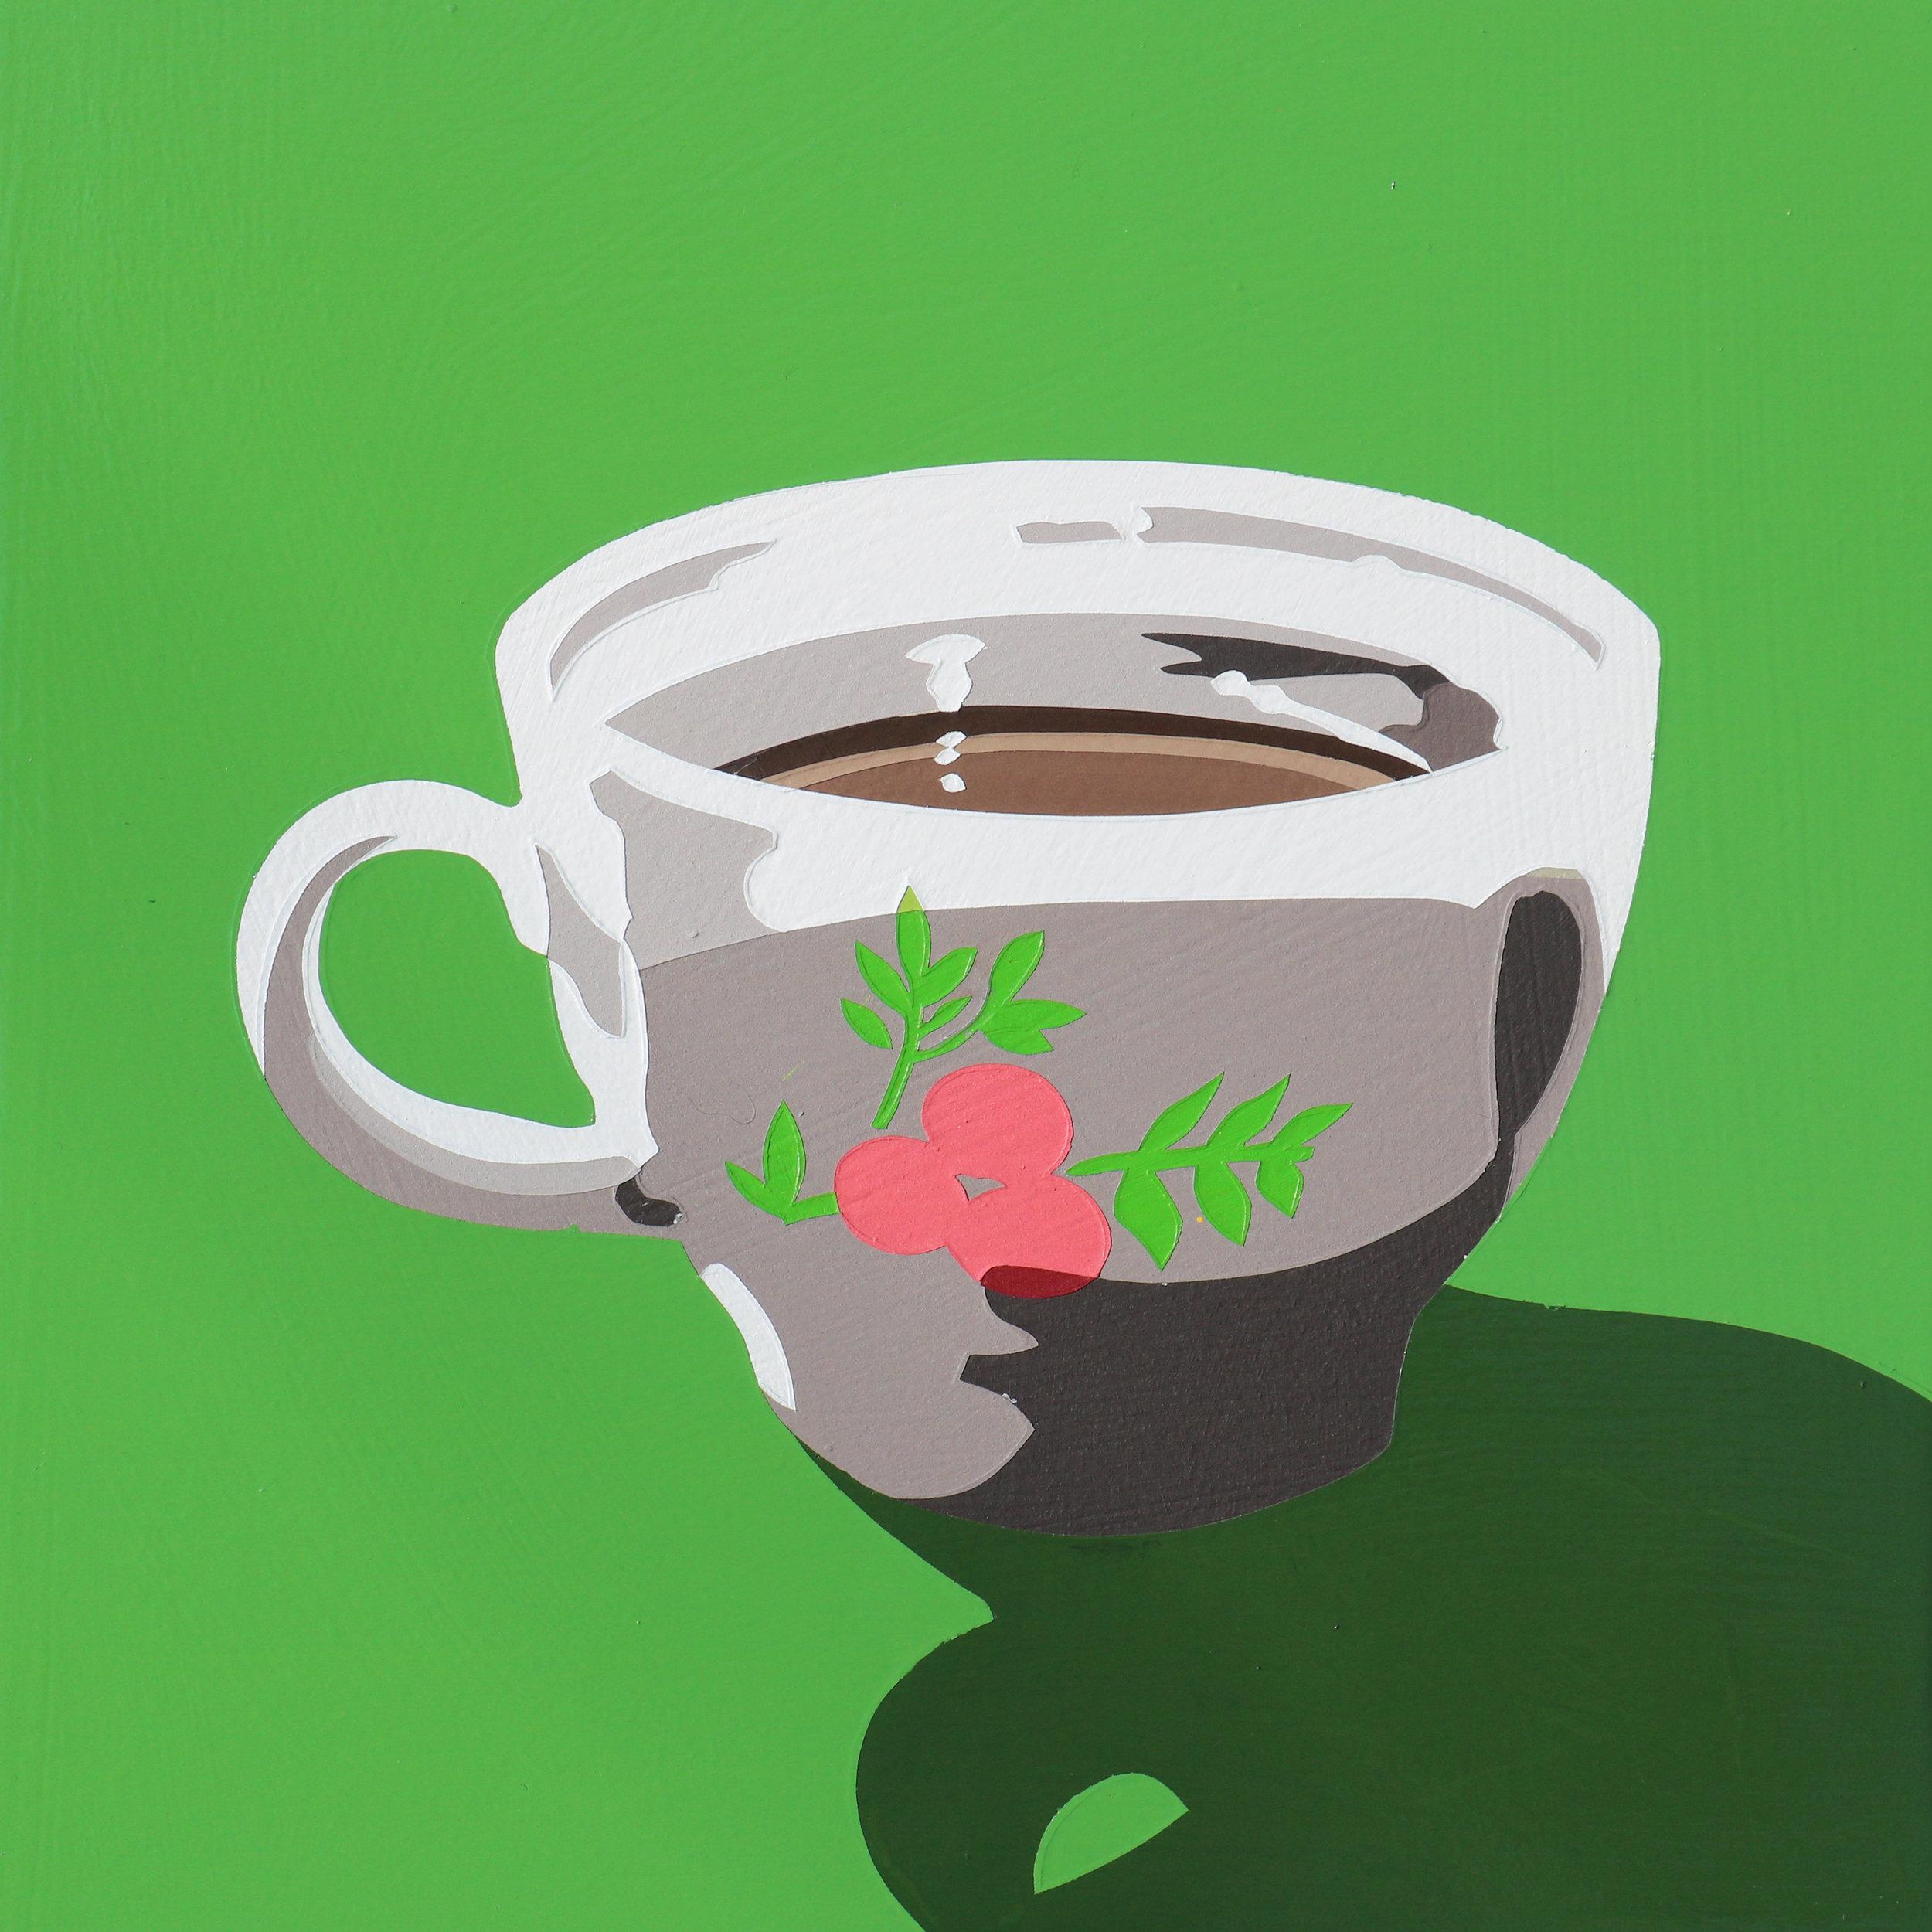 greens_cup_1.jpg